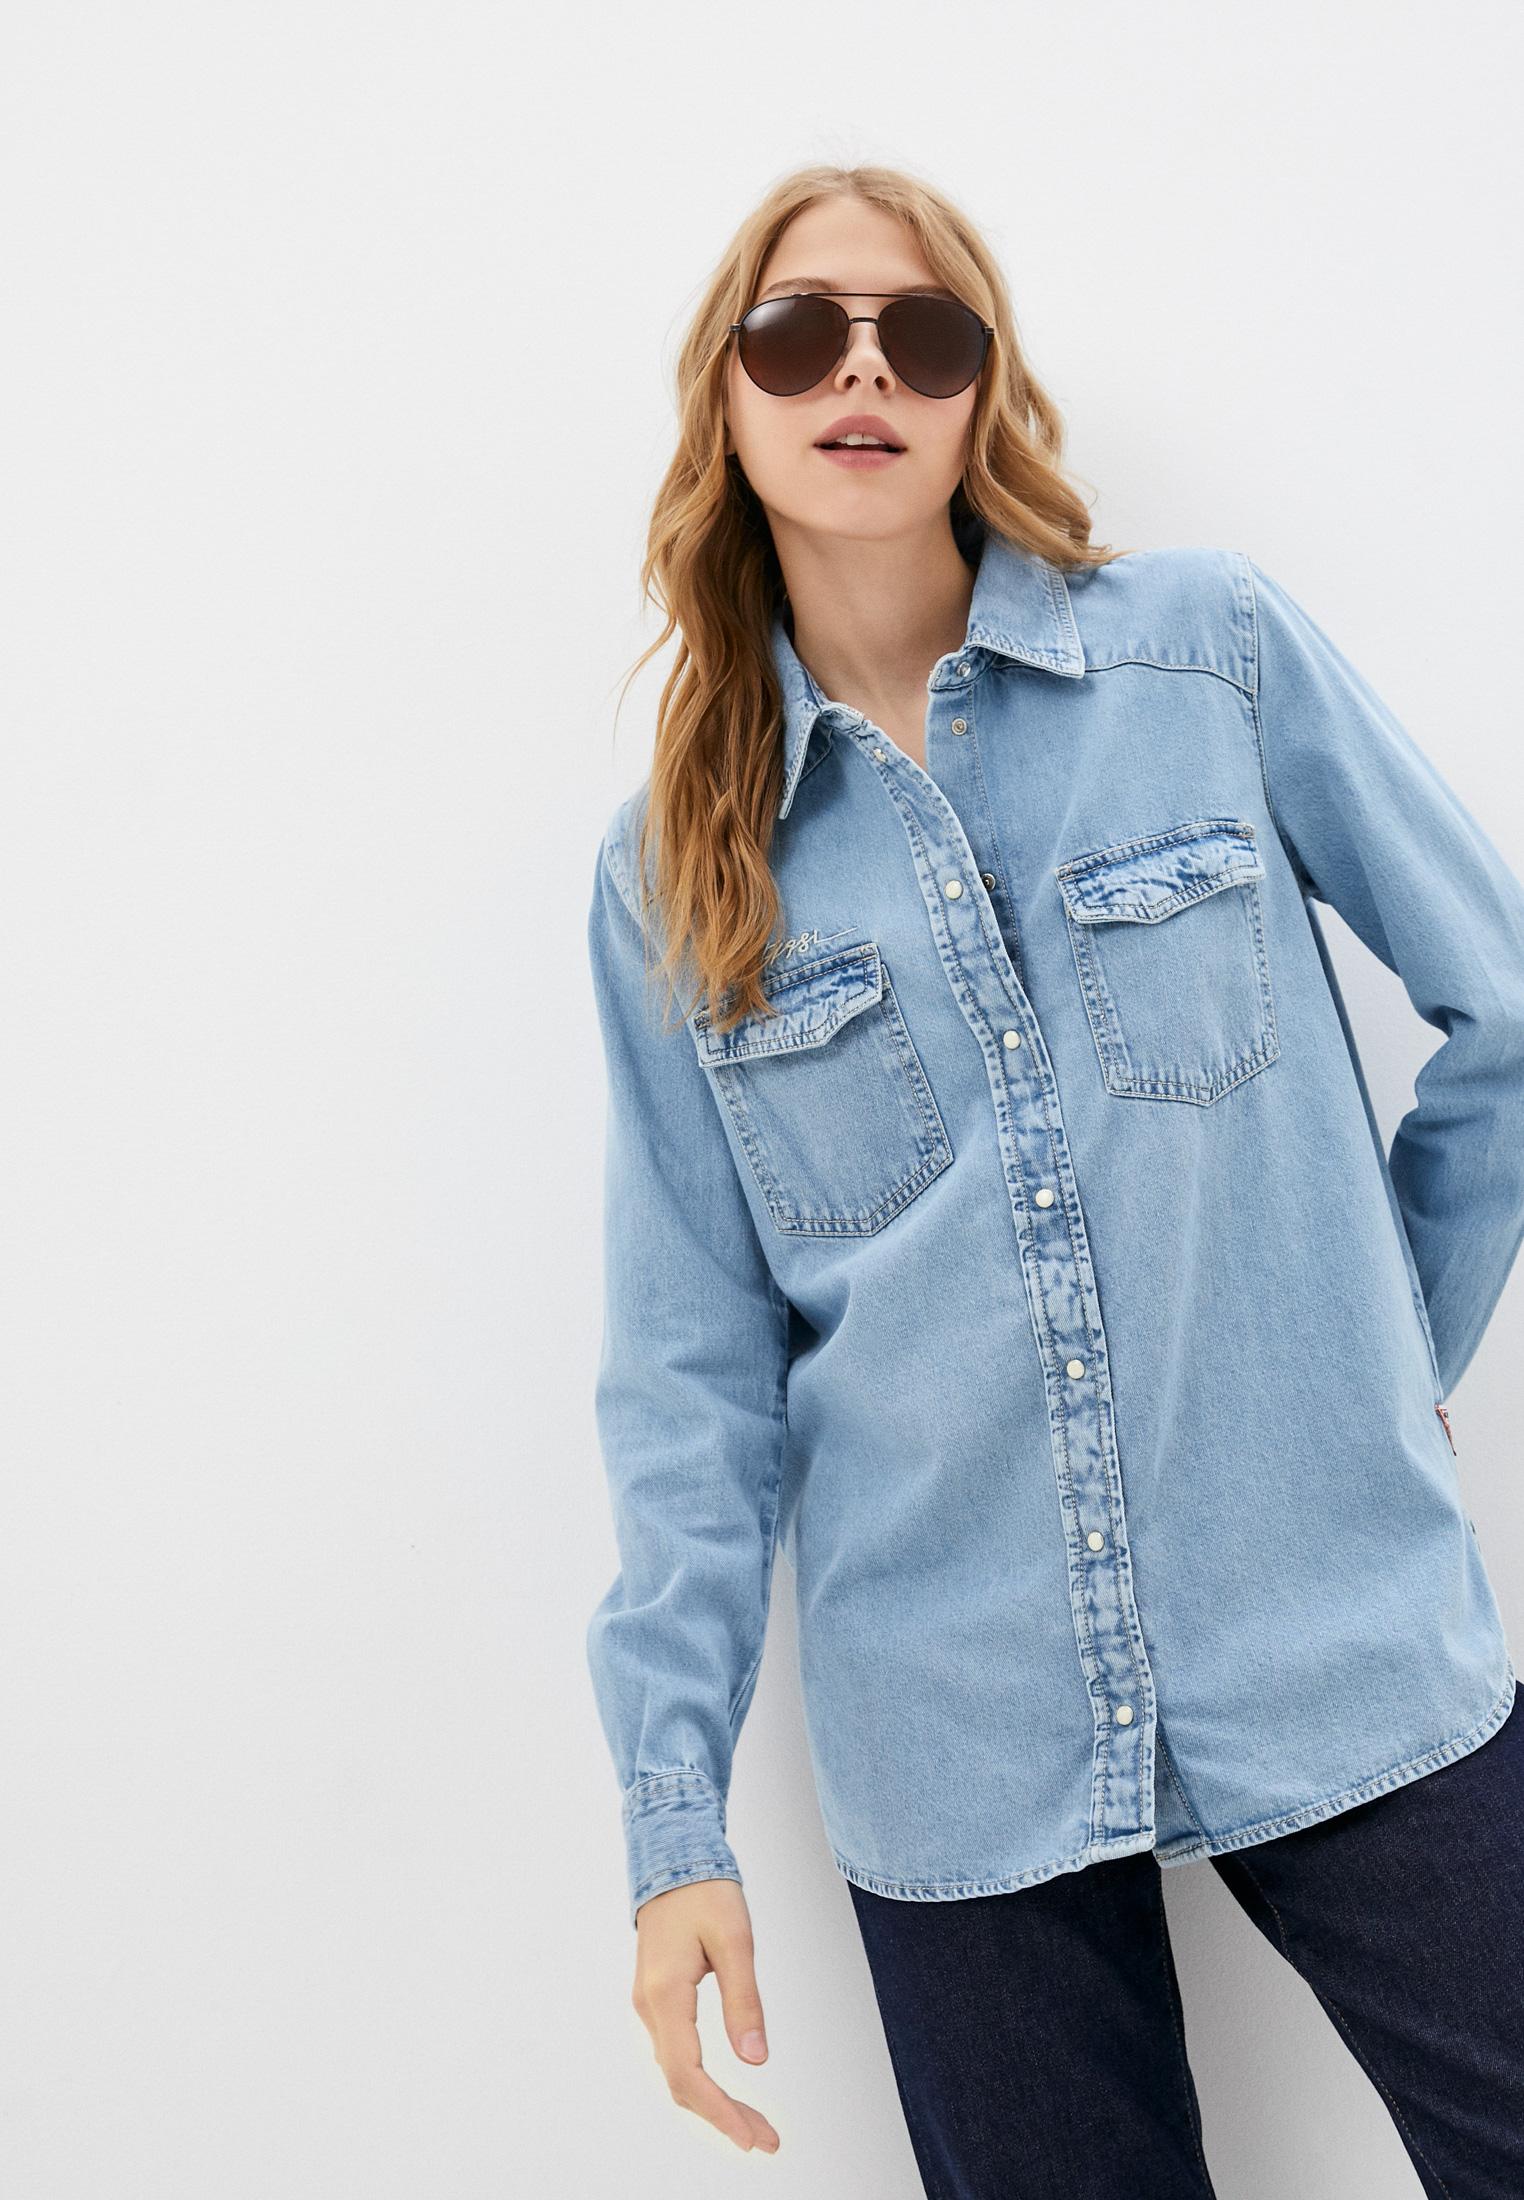 Рубашка Guess Jeans Рубашка джинсовая Guess Jeans